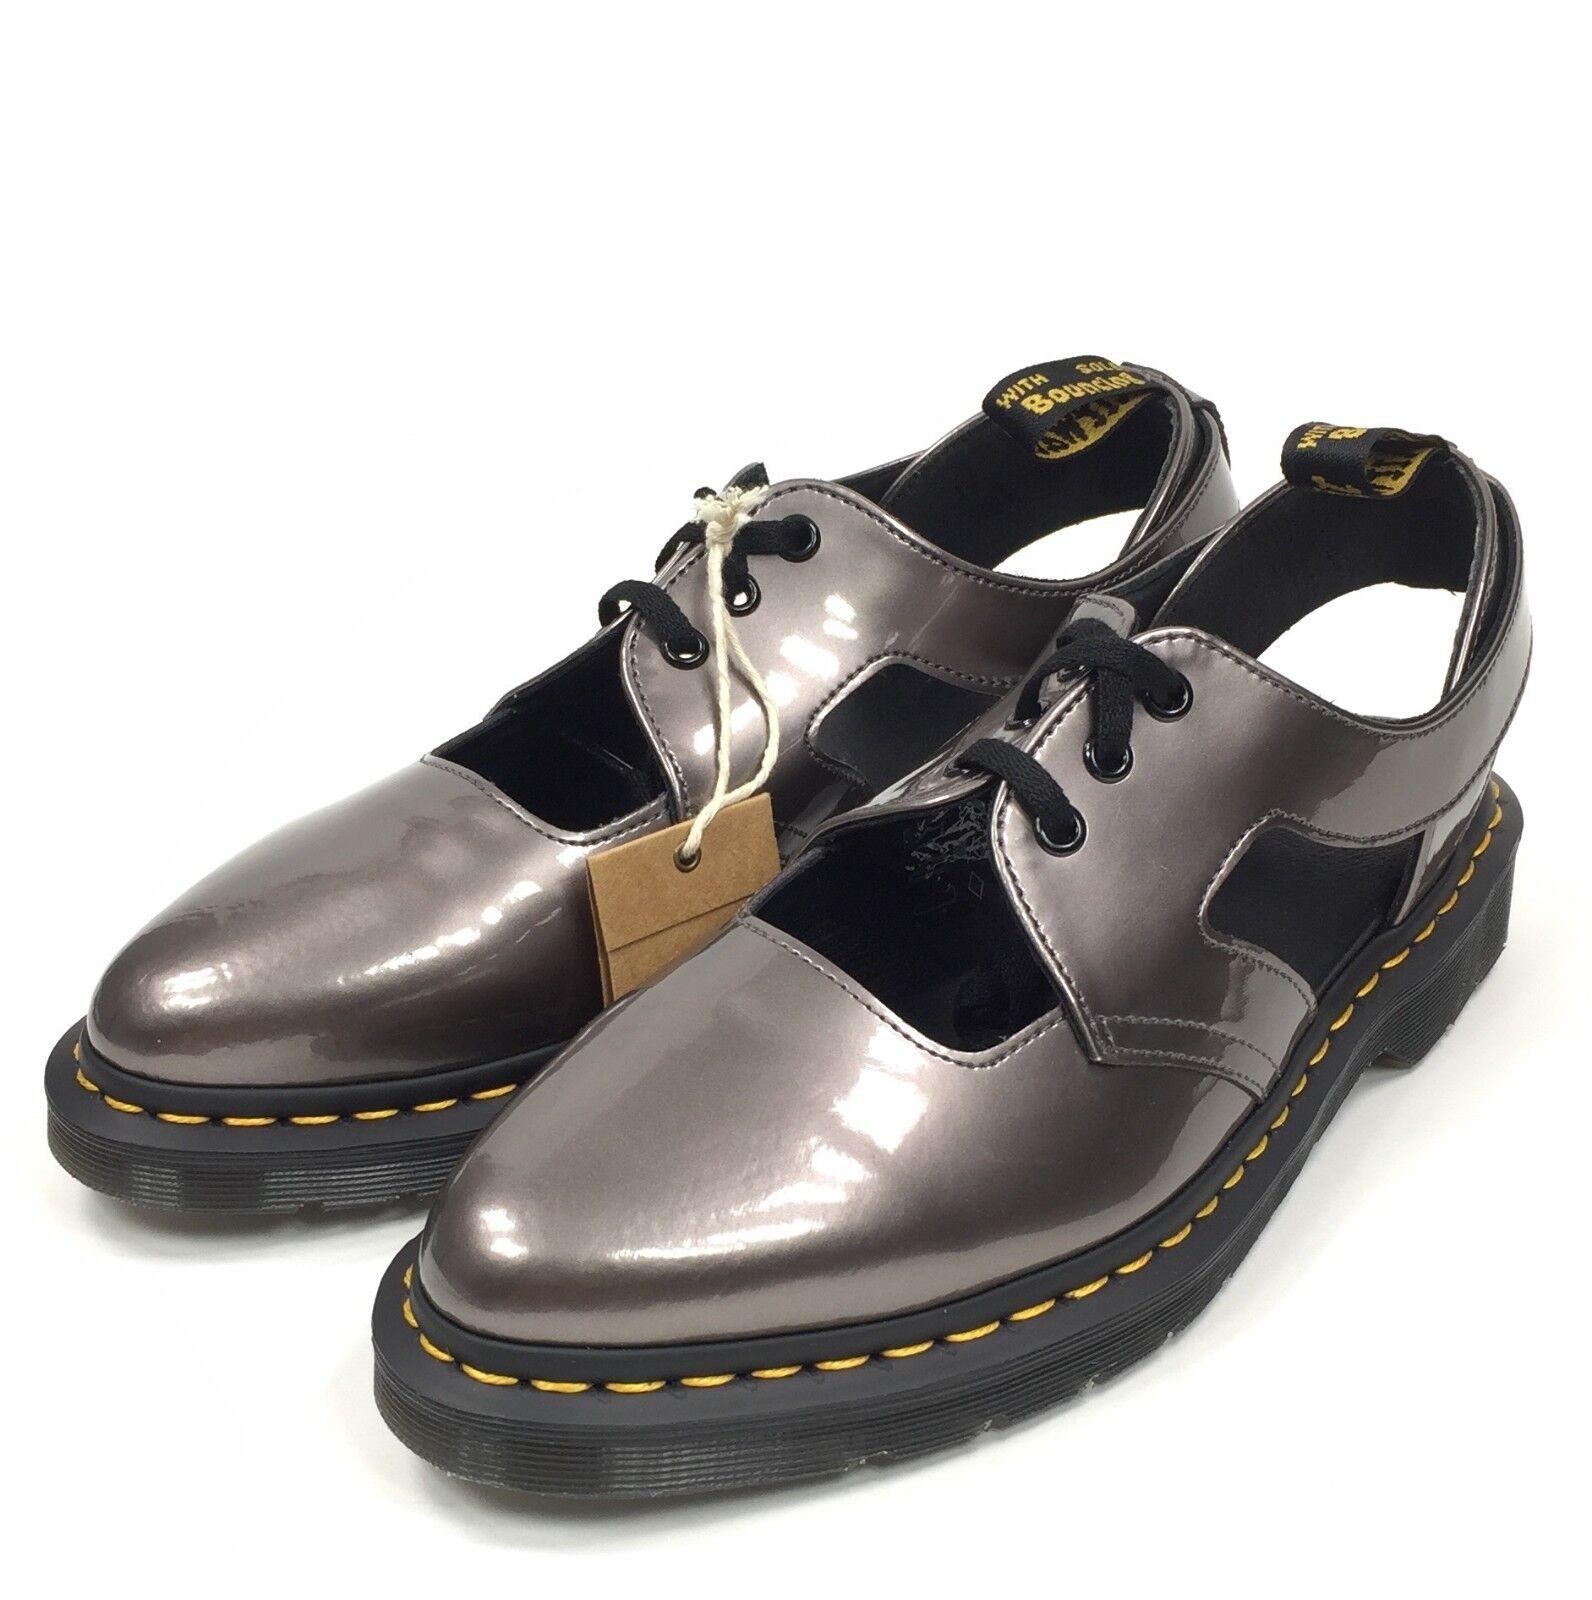 Dr Doc Martens Genna Größe 11 damen Patent Leather Leather Leather Metallic Cutout Oxford schuhe 49738f